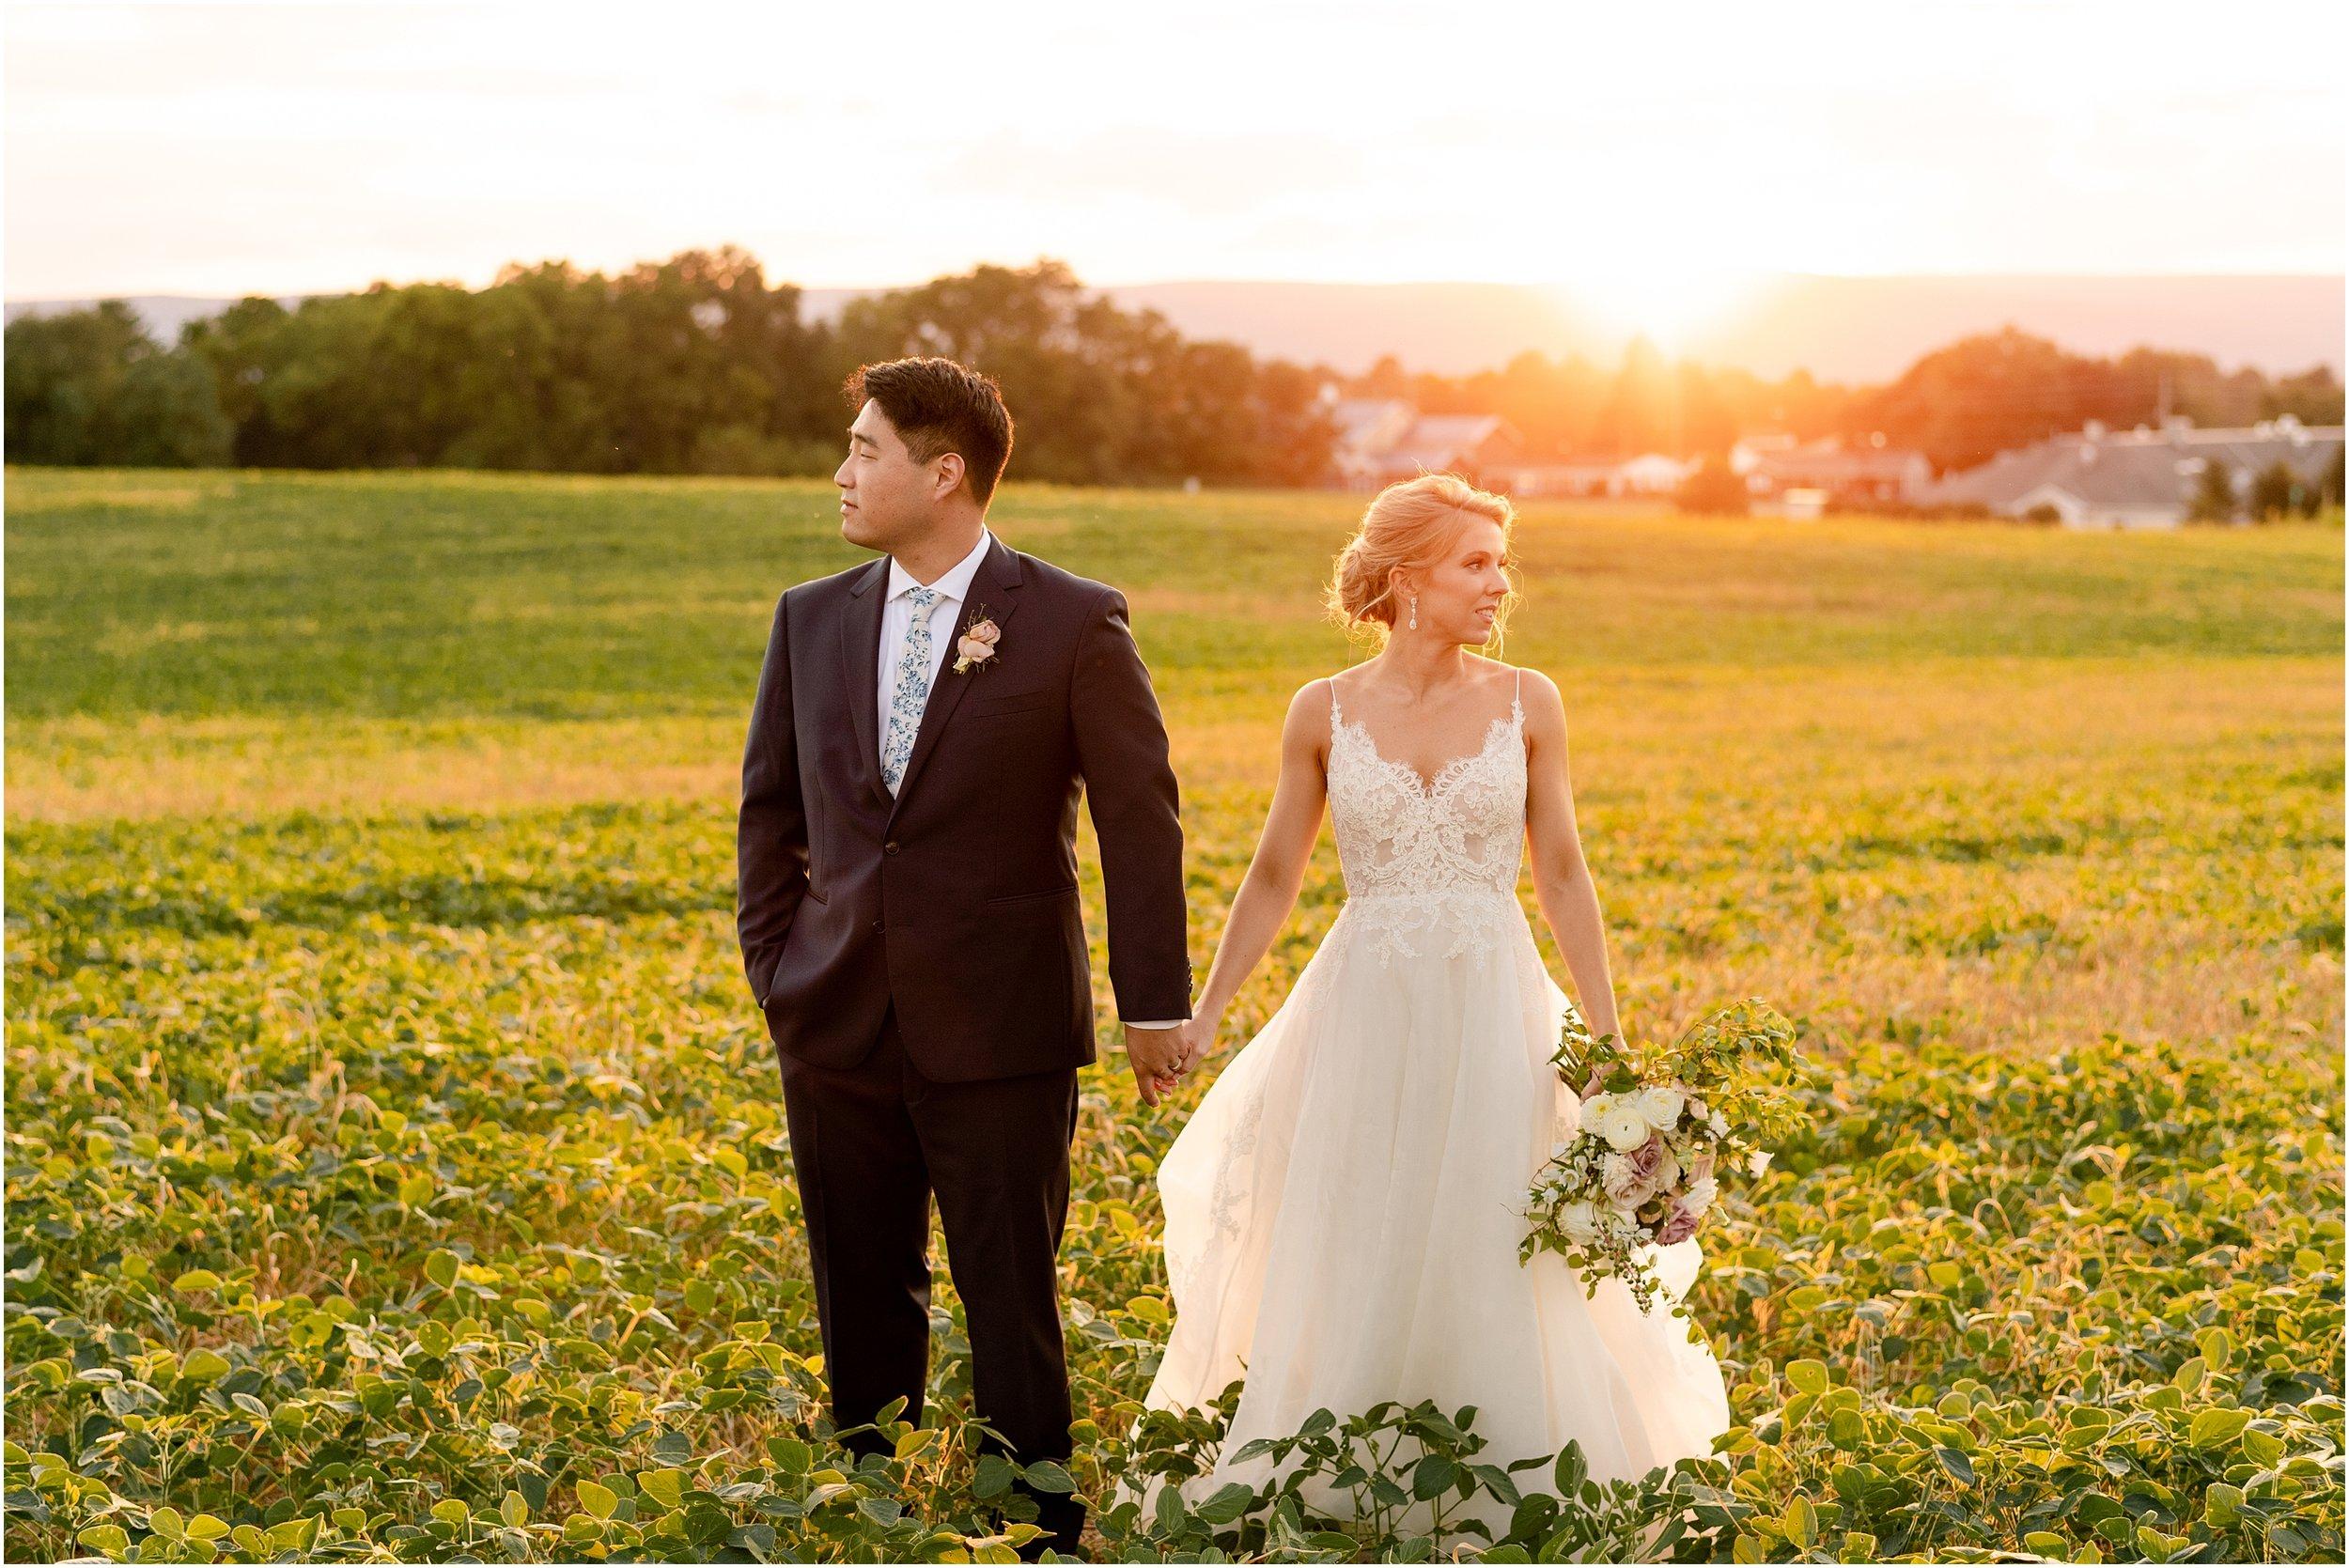 hannah leigh photography Walkers Overlook Wedding Walkersville MD_3569.jpg